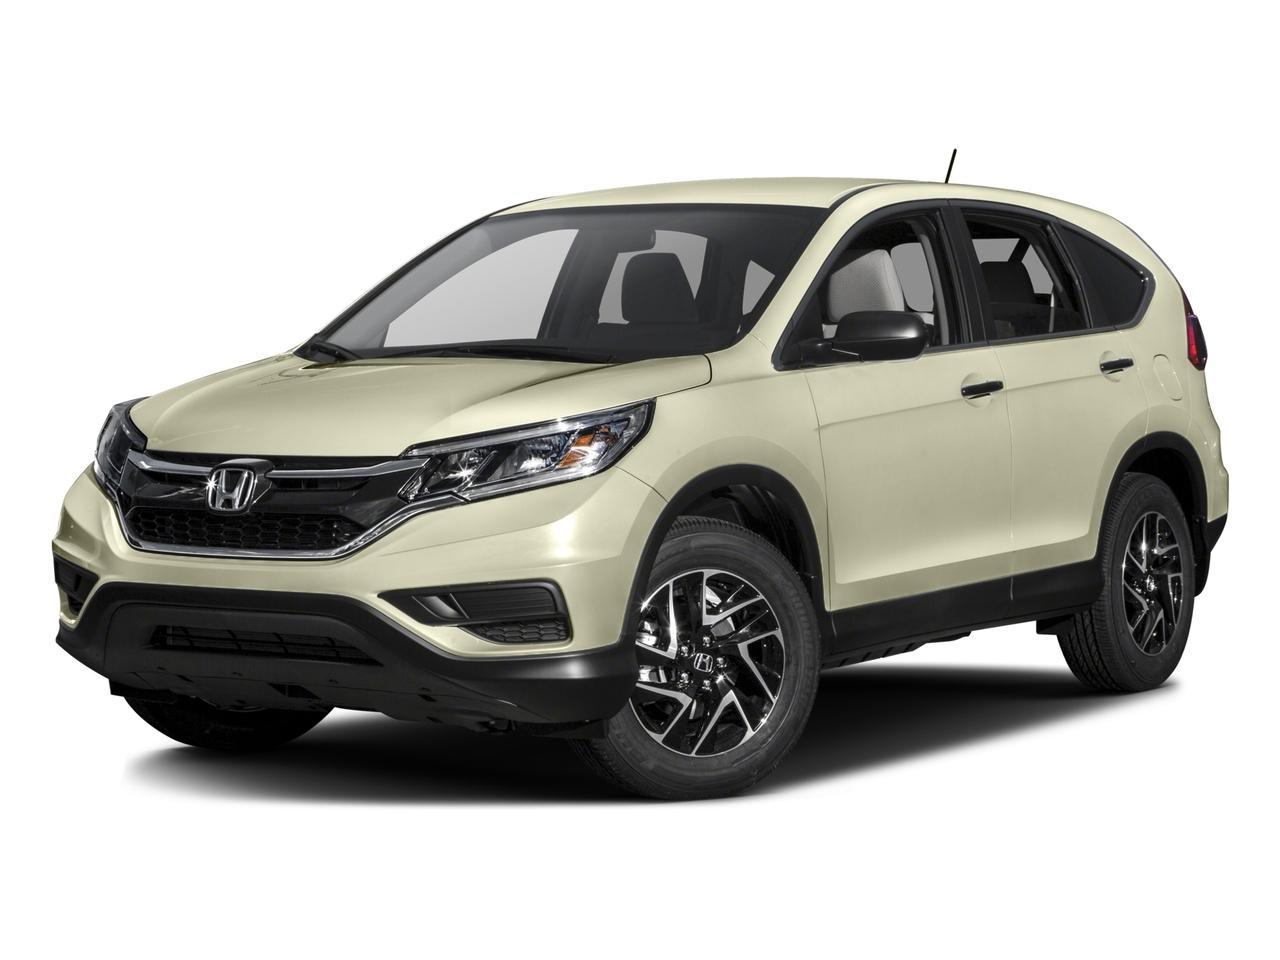 2016 Honda CR-V Vehicle Photo in Grapevine, TX 76051